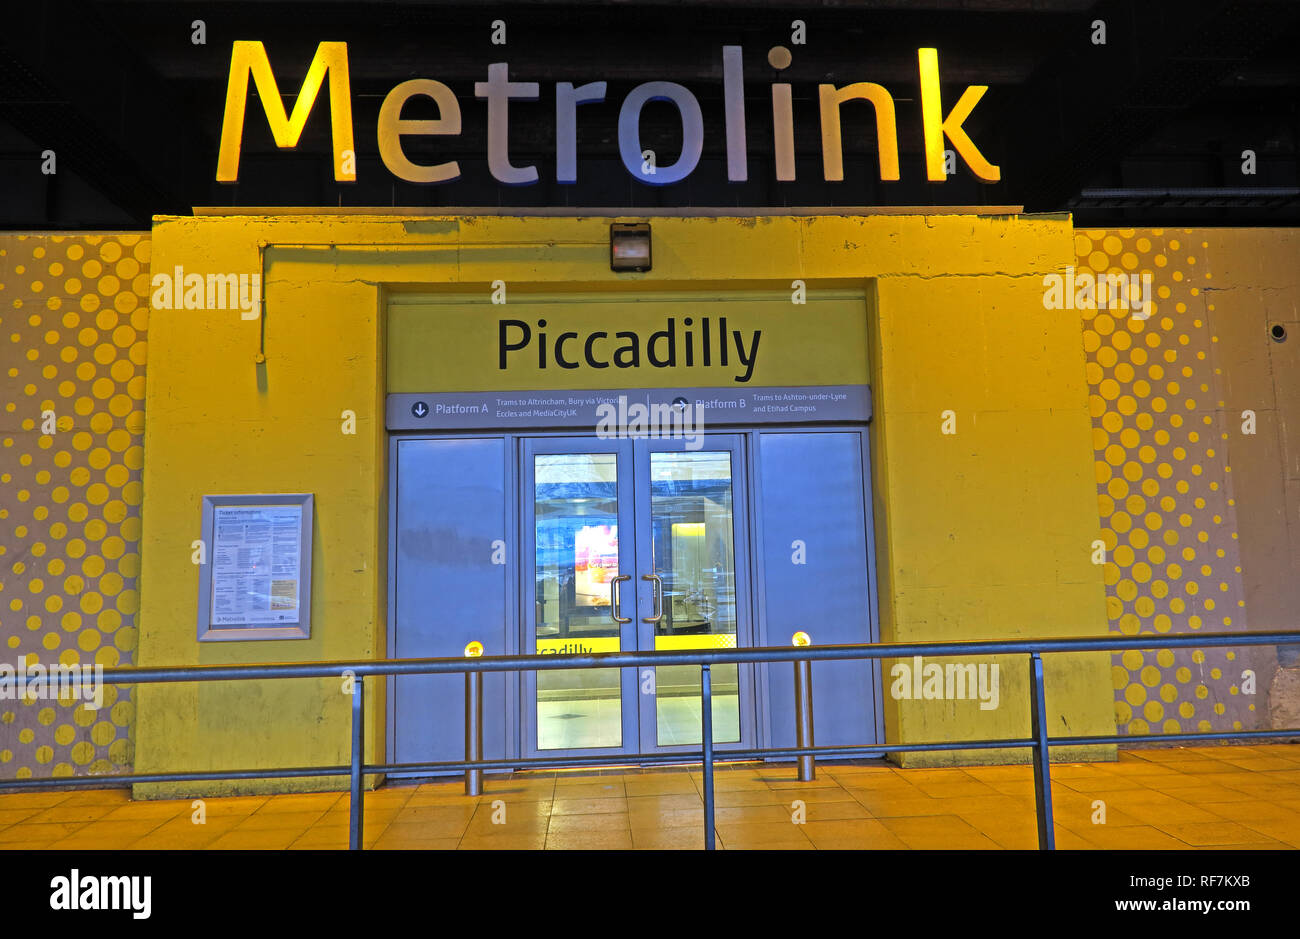 Manchester City Centre,Manchester,City Centre,city,NQ,NQ4,Northern Quarter,North West,England,UK,GoTonySmith,HotpixUK,@HotpixUK,buildings,streets,Station,Railway Station,Rail,Terminal,Manchester Piccadilly Station,Network Rail,NetworkRail,Tram station,yellow,Entrance,door,doorway,gate,network,M1 2QF,trams,Tram Network,Light Rail,Light Rail Station,logo,Piccadilly Metrolink Stop,Piccadilly Metrolink,stop